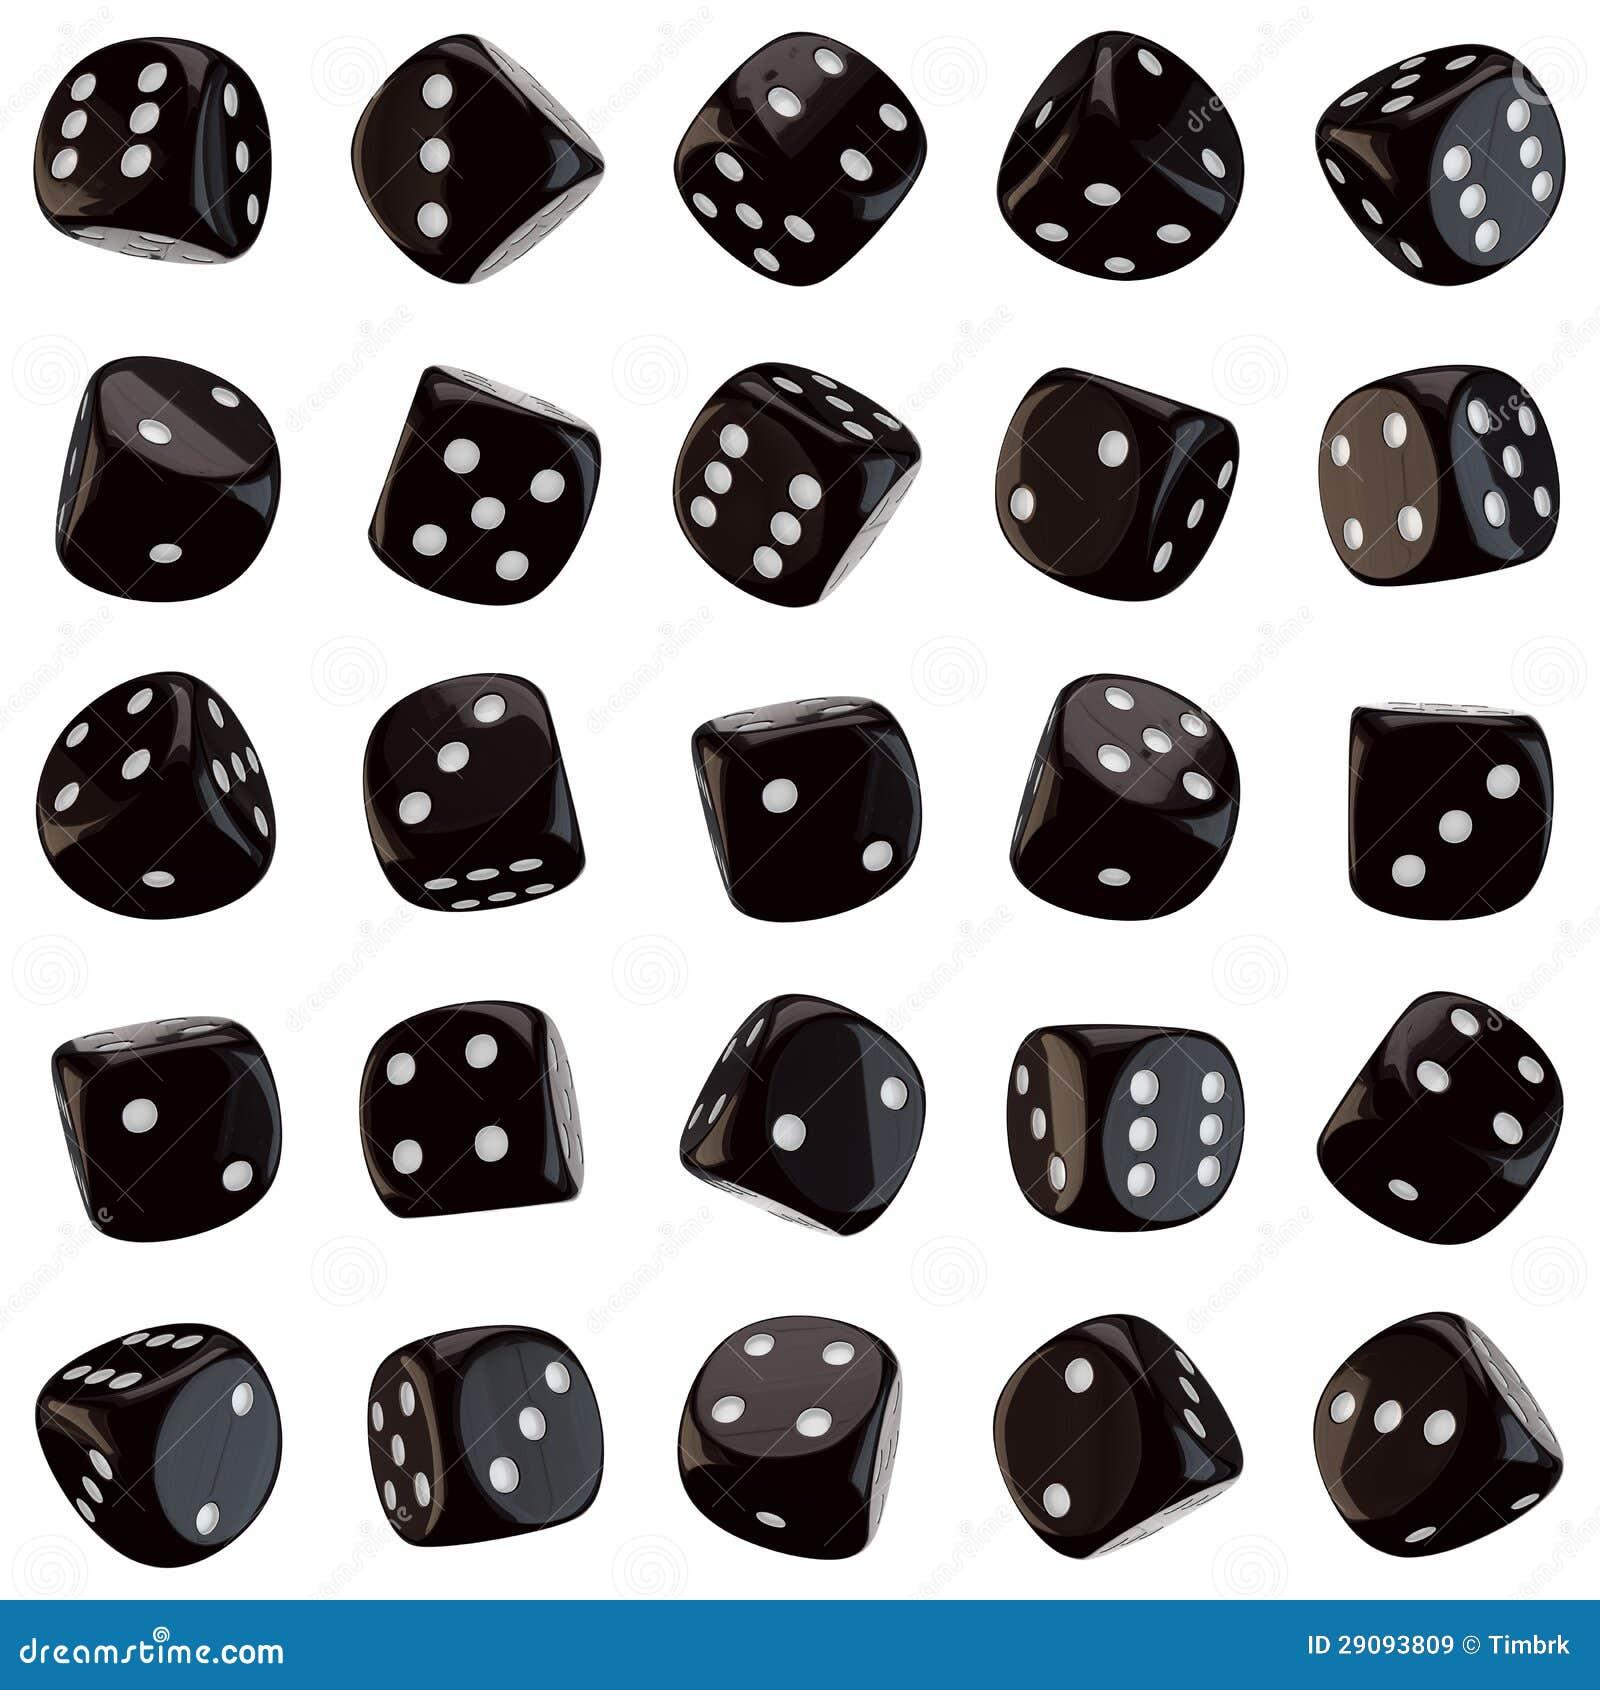 black dice icons stock illustration illustration of dots 29093809